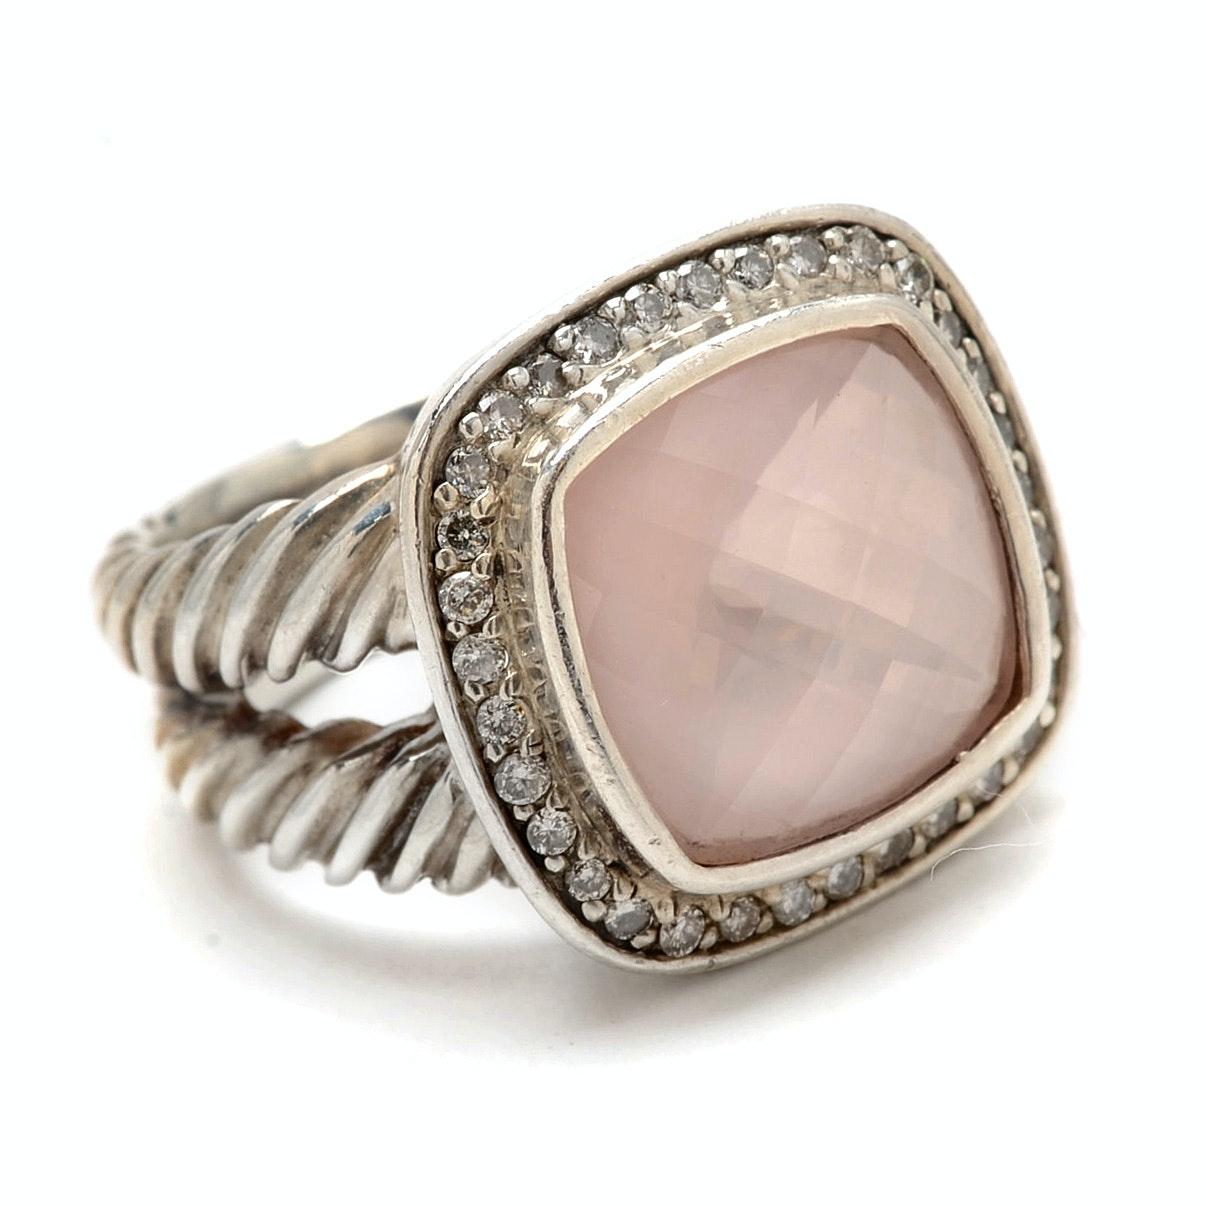 David Yurman Sterling Silver Ring with Rose Quartz and Diamond Setting